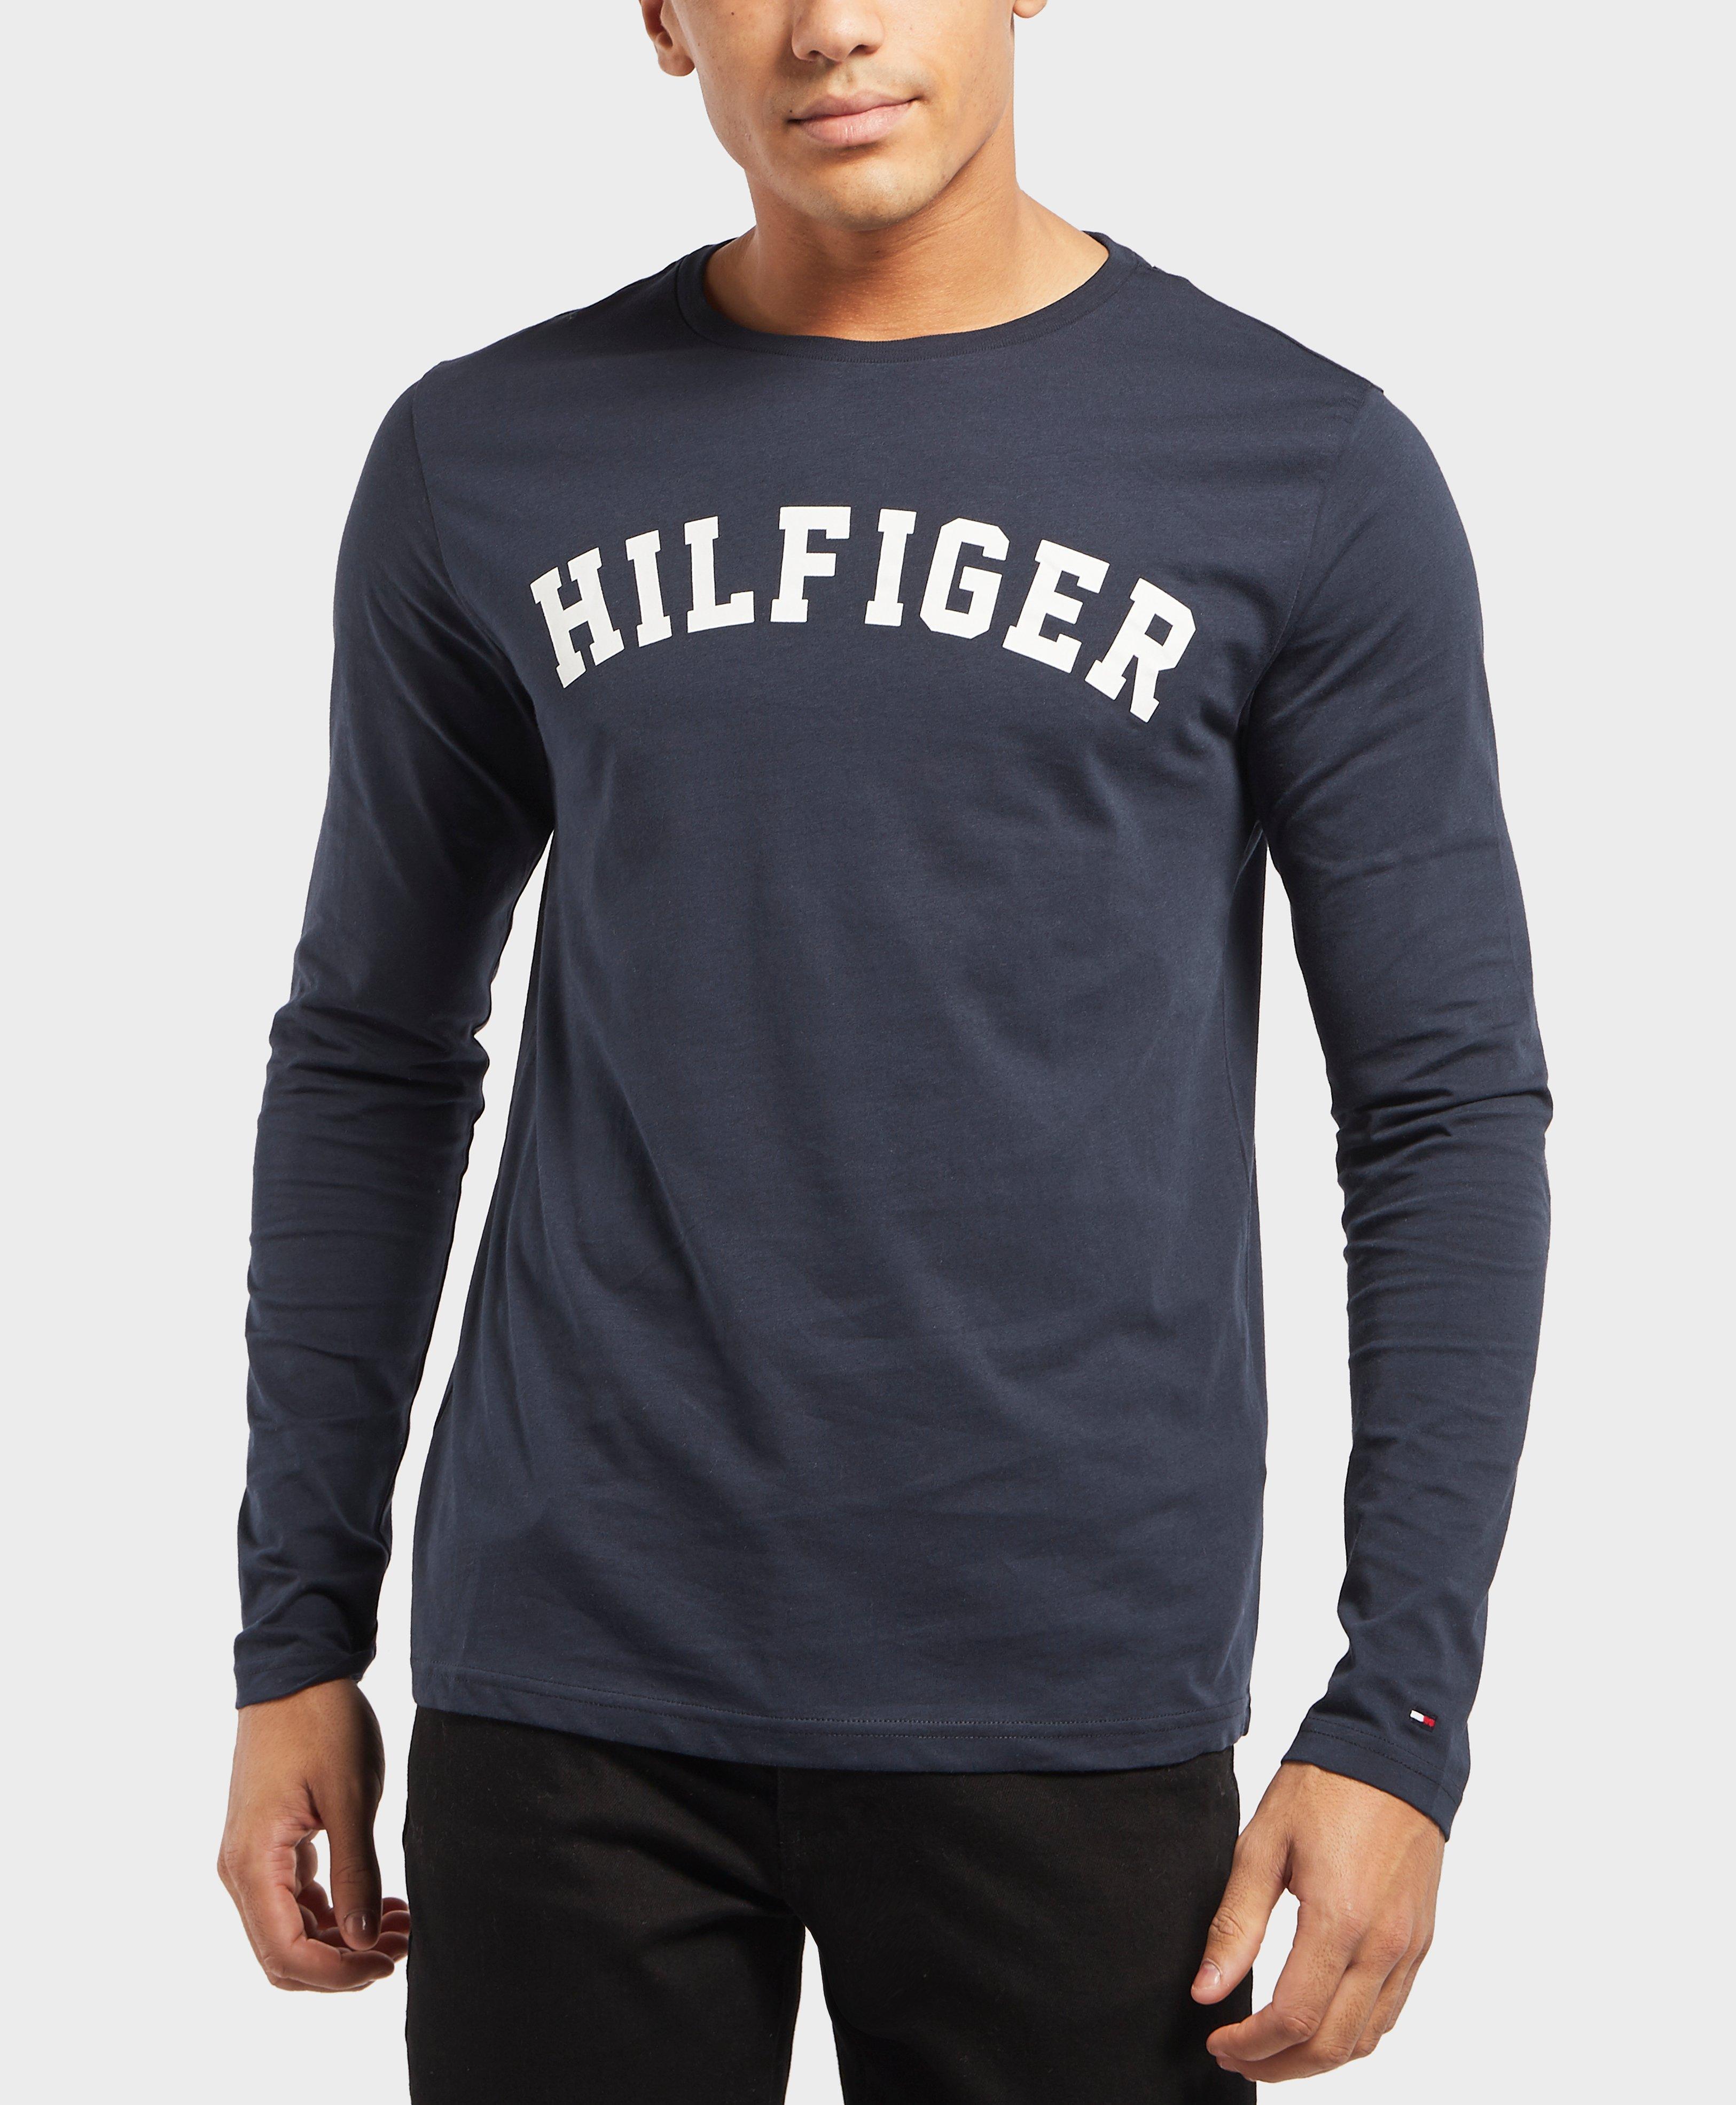 3d0b6a9e Tommy Hilfiger Long Sleeve Logo T-shirt in Blue for Men - Lyst